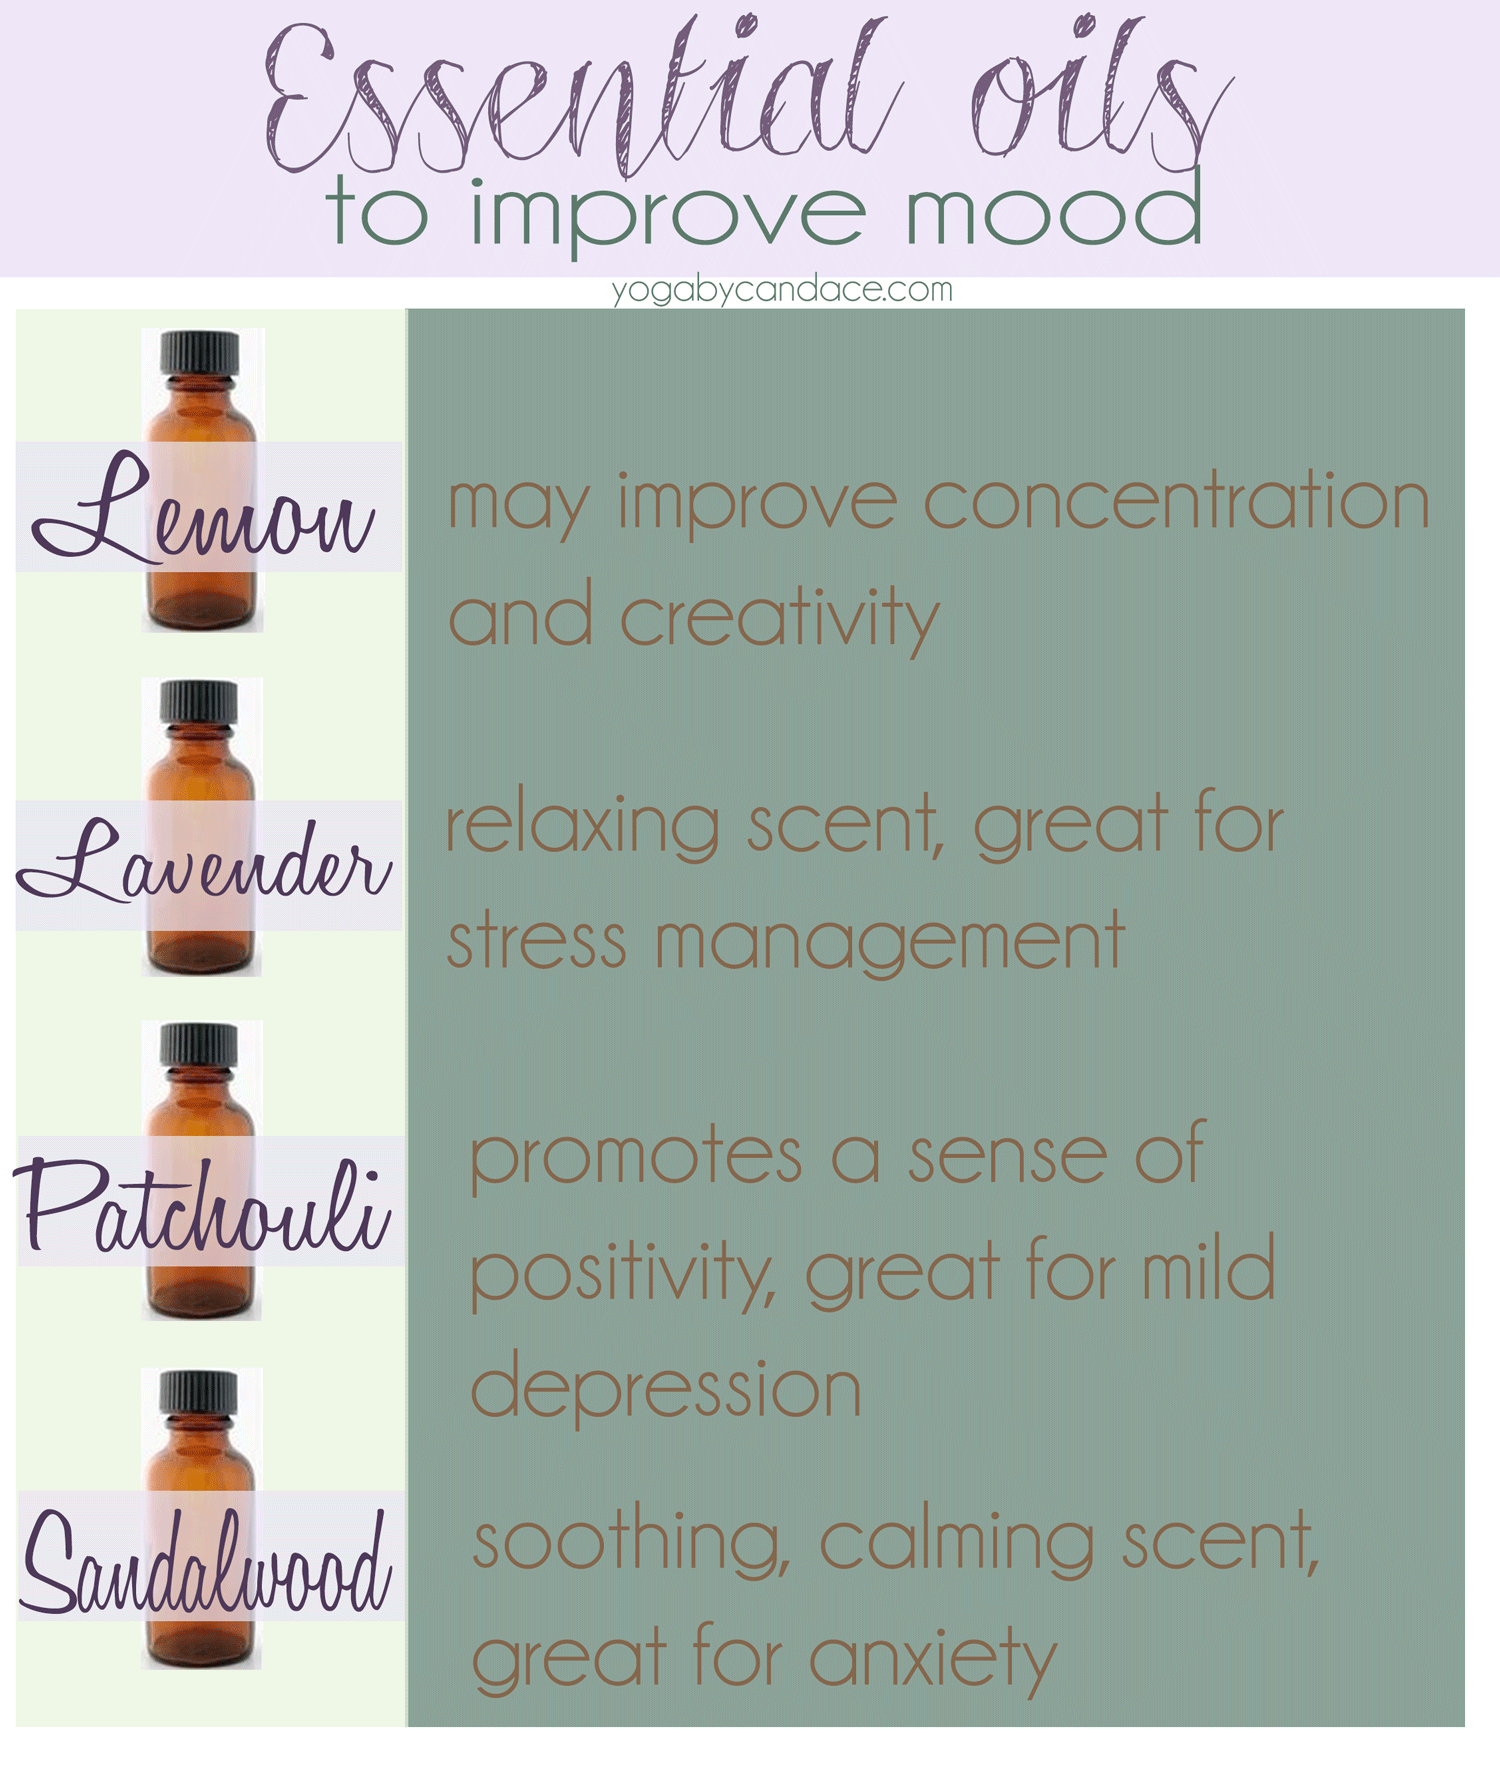 A few essential oils that may improve mood